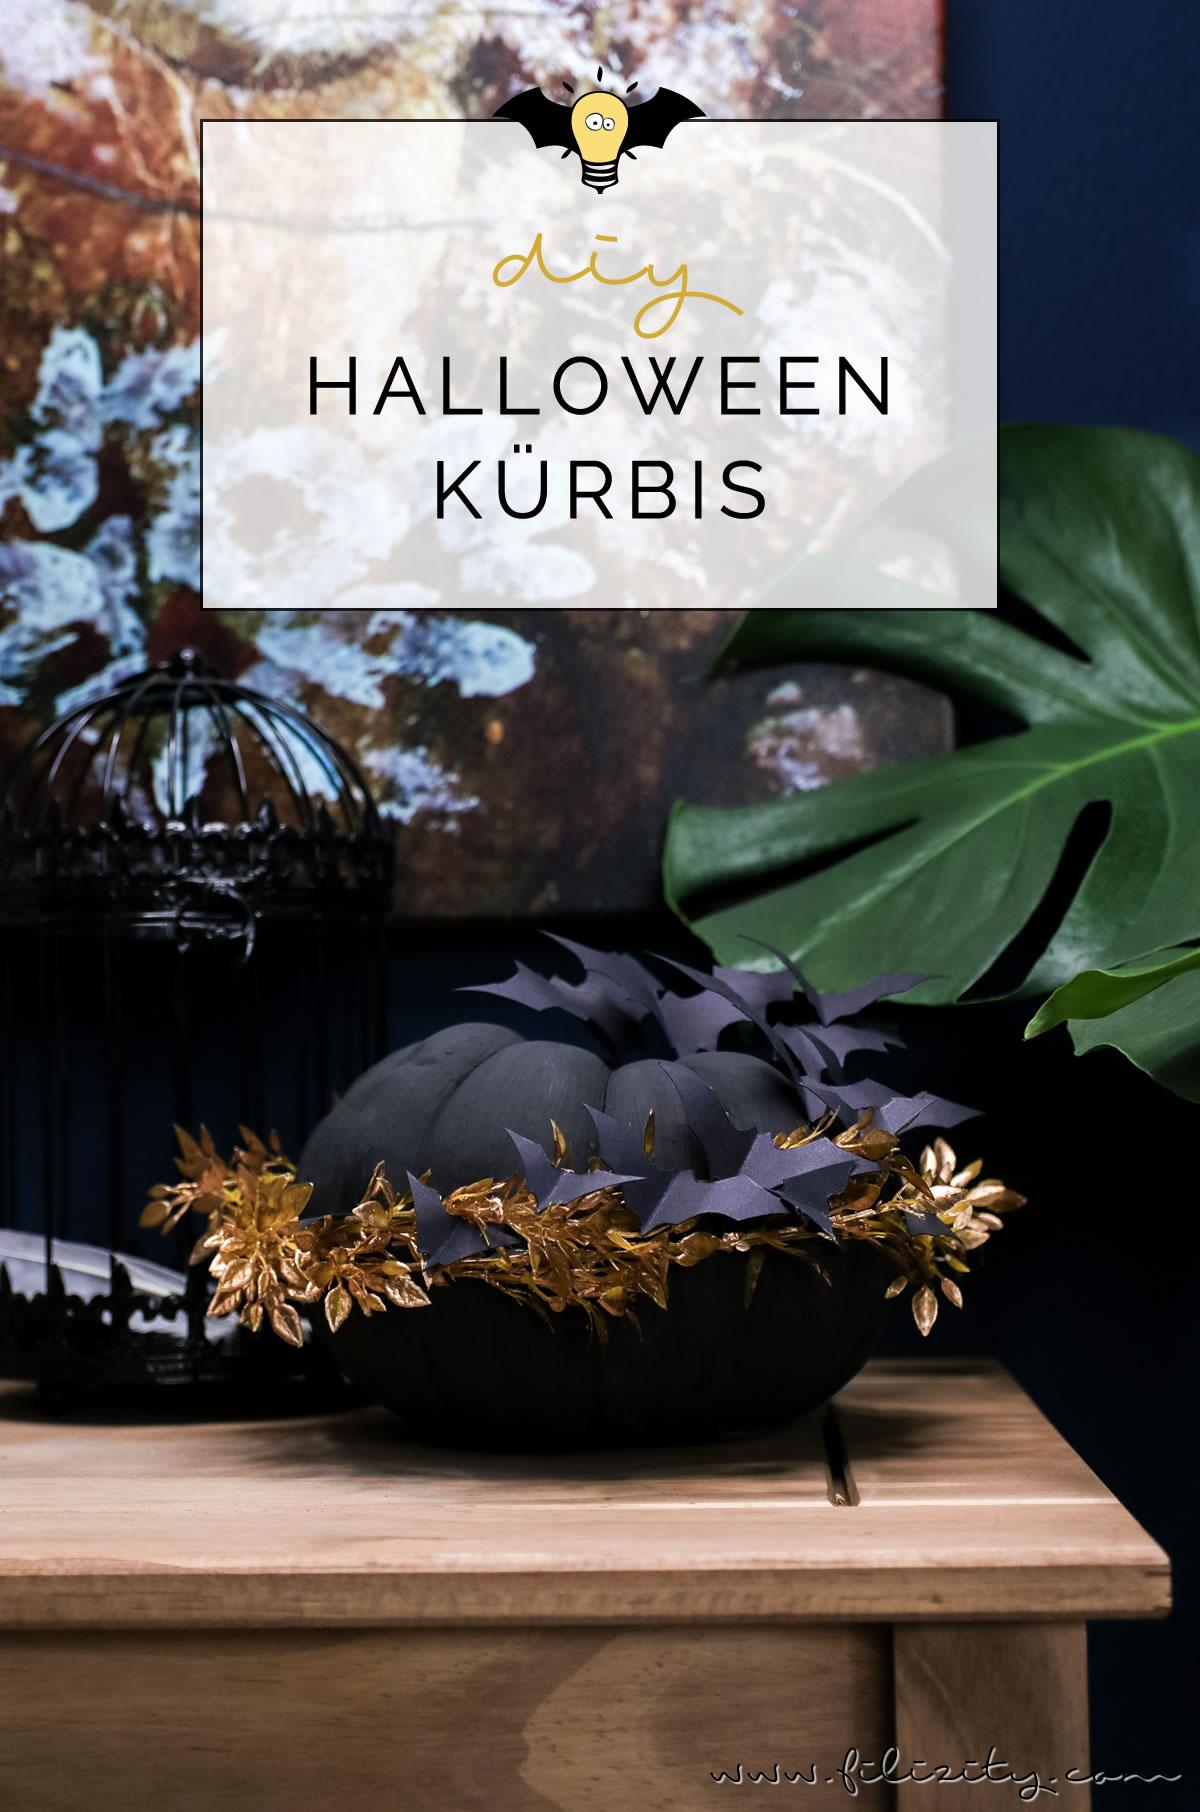 diy halloween deko kuerbis fledermaus selber machen grusel party dekoration basteln diy blog 12 min